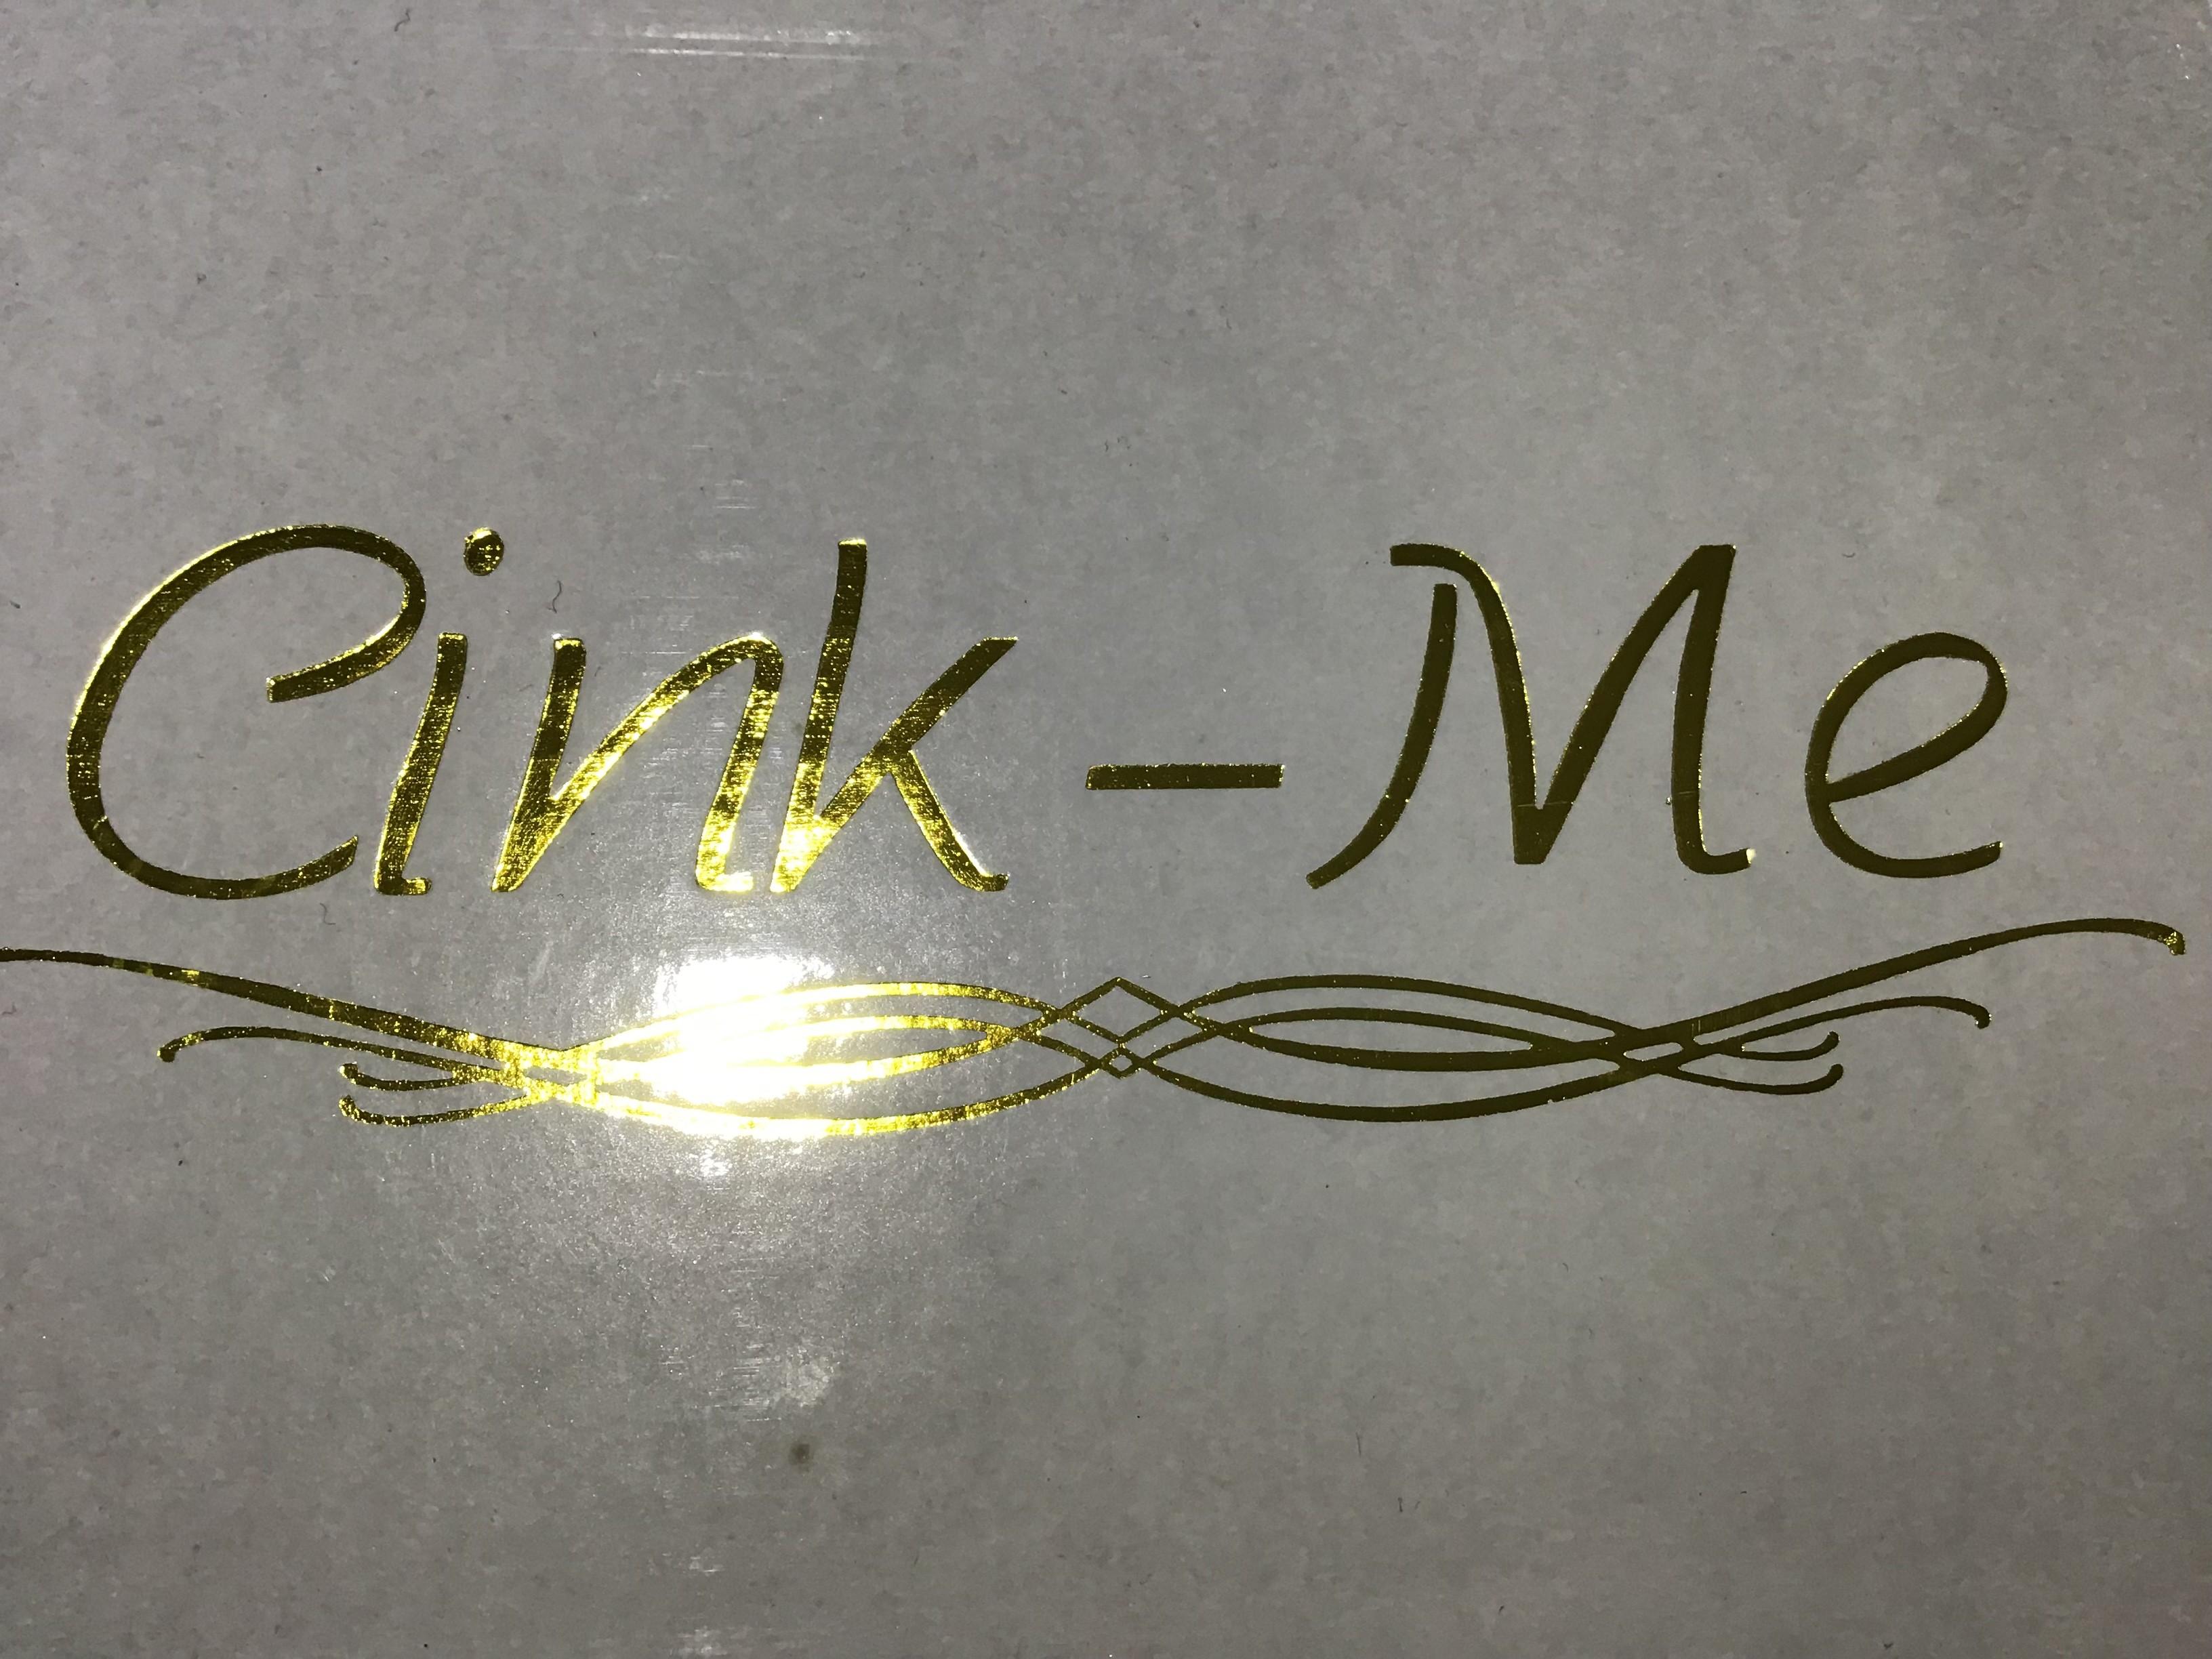 Cink-me